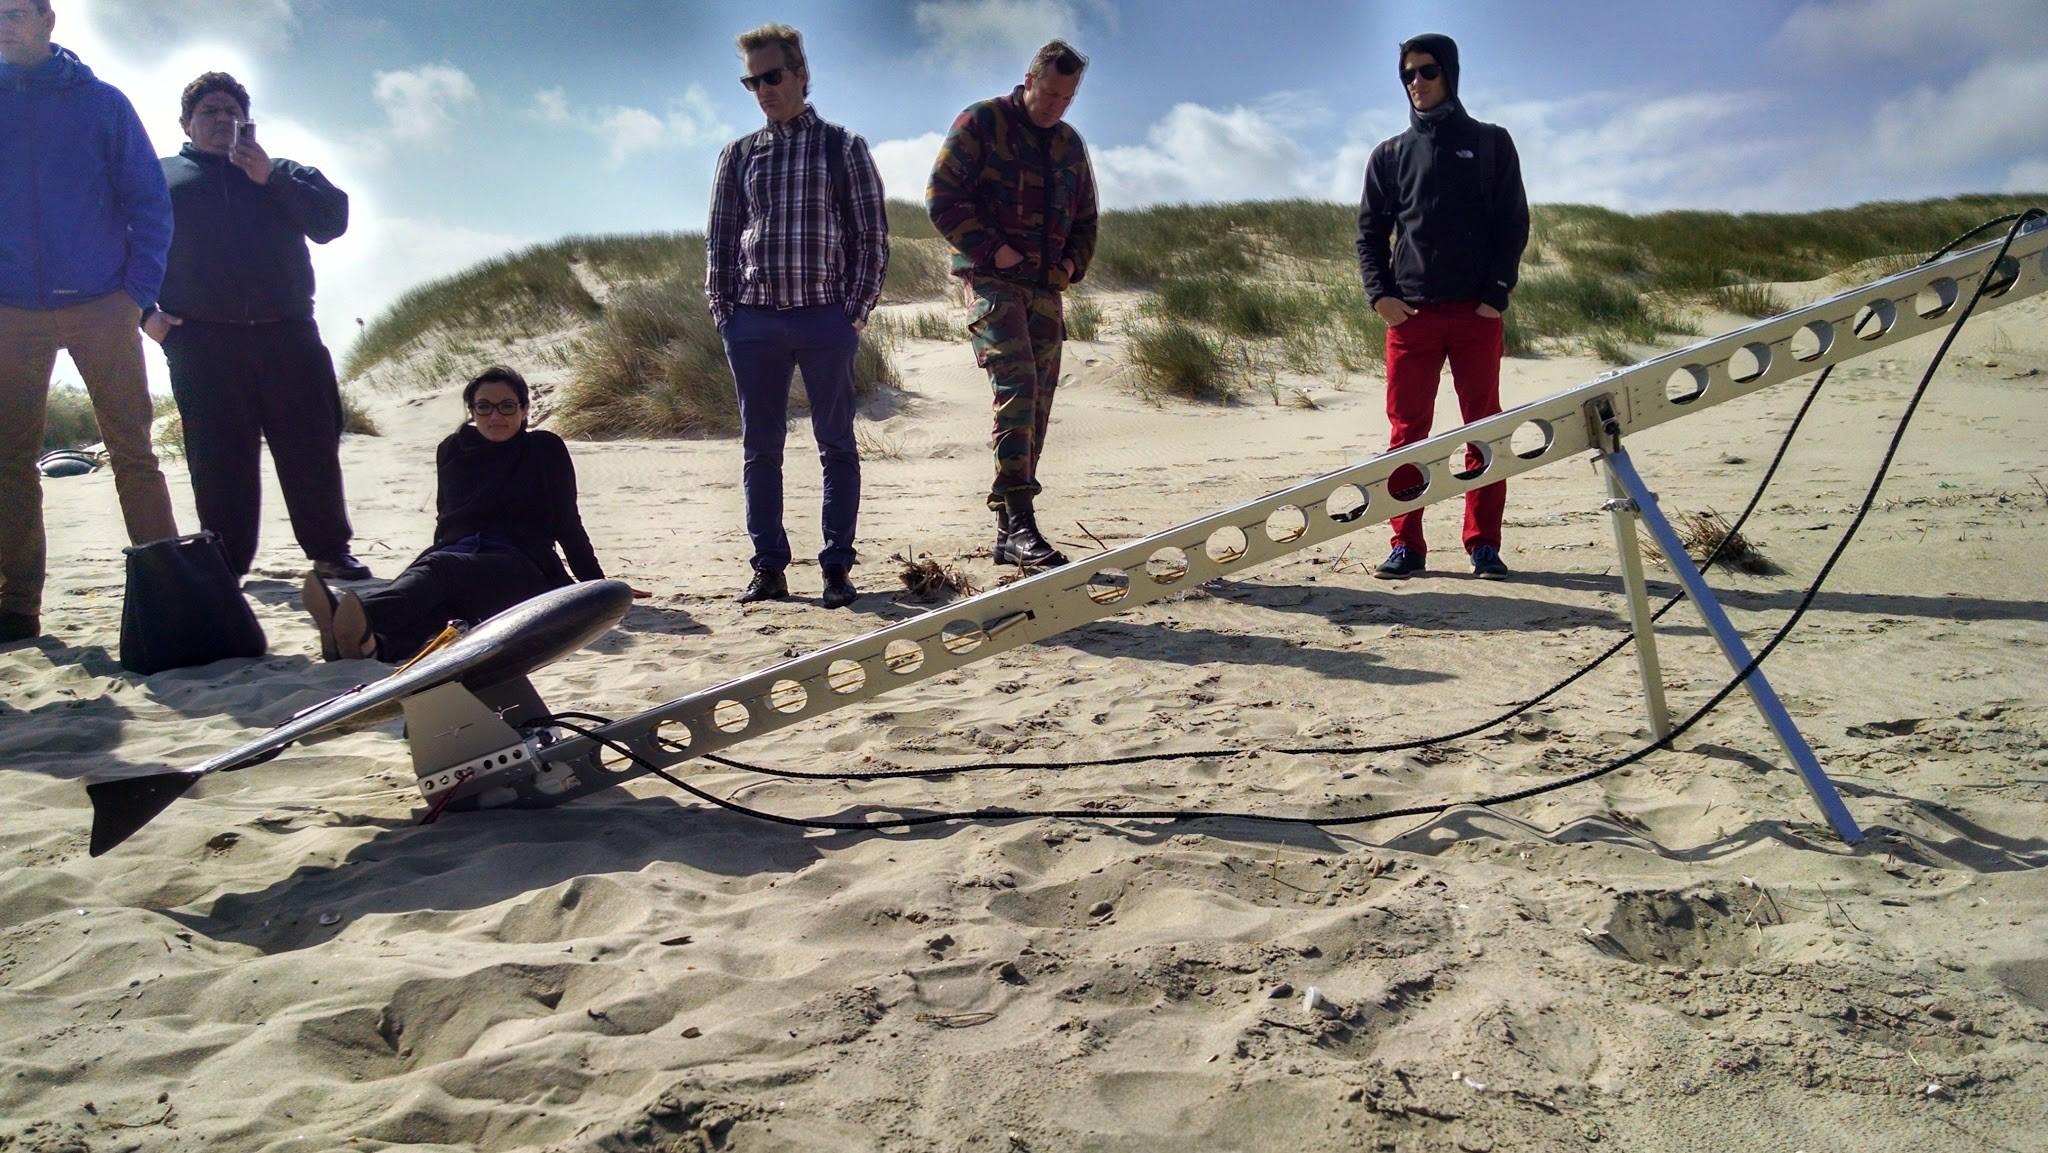 Trimble Drone Launch. First Global Humanitarian UAV Training